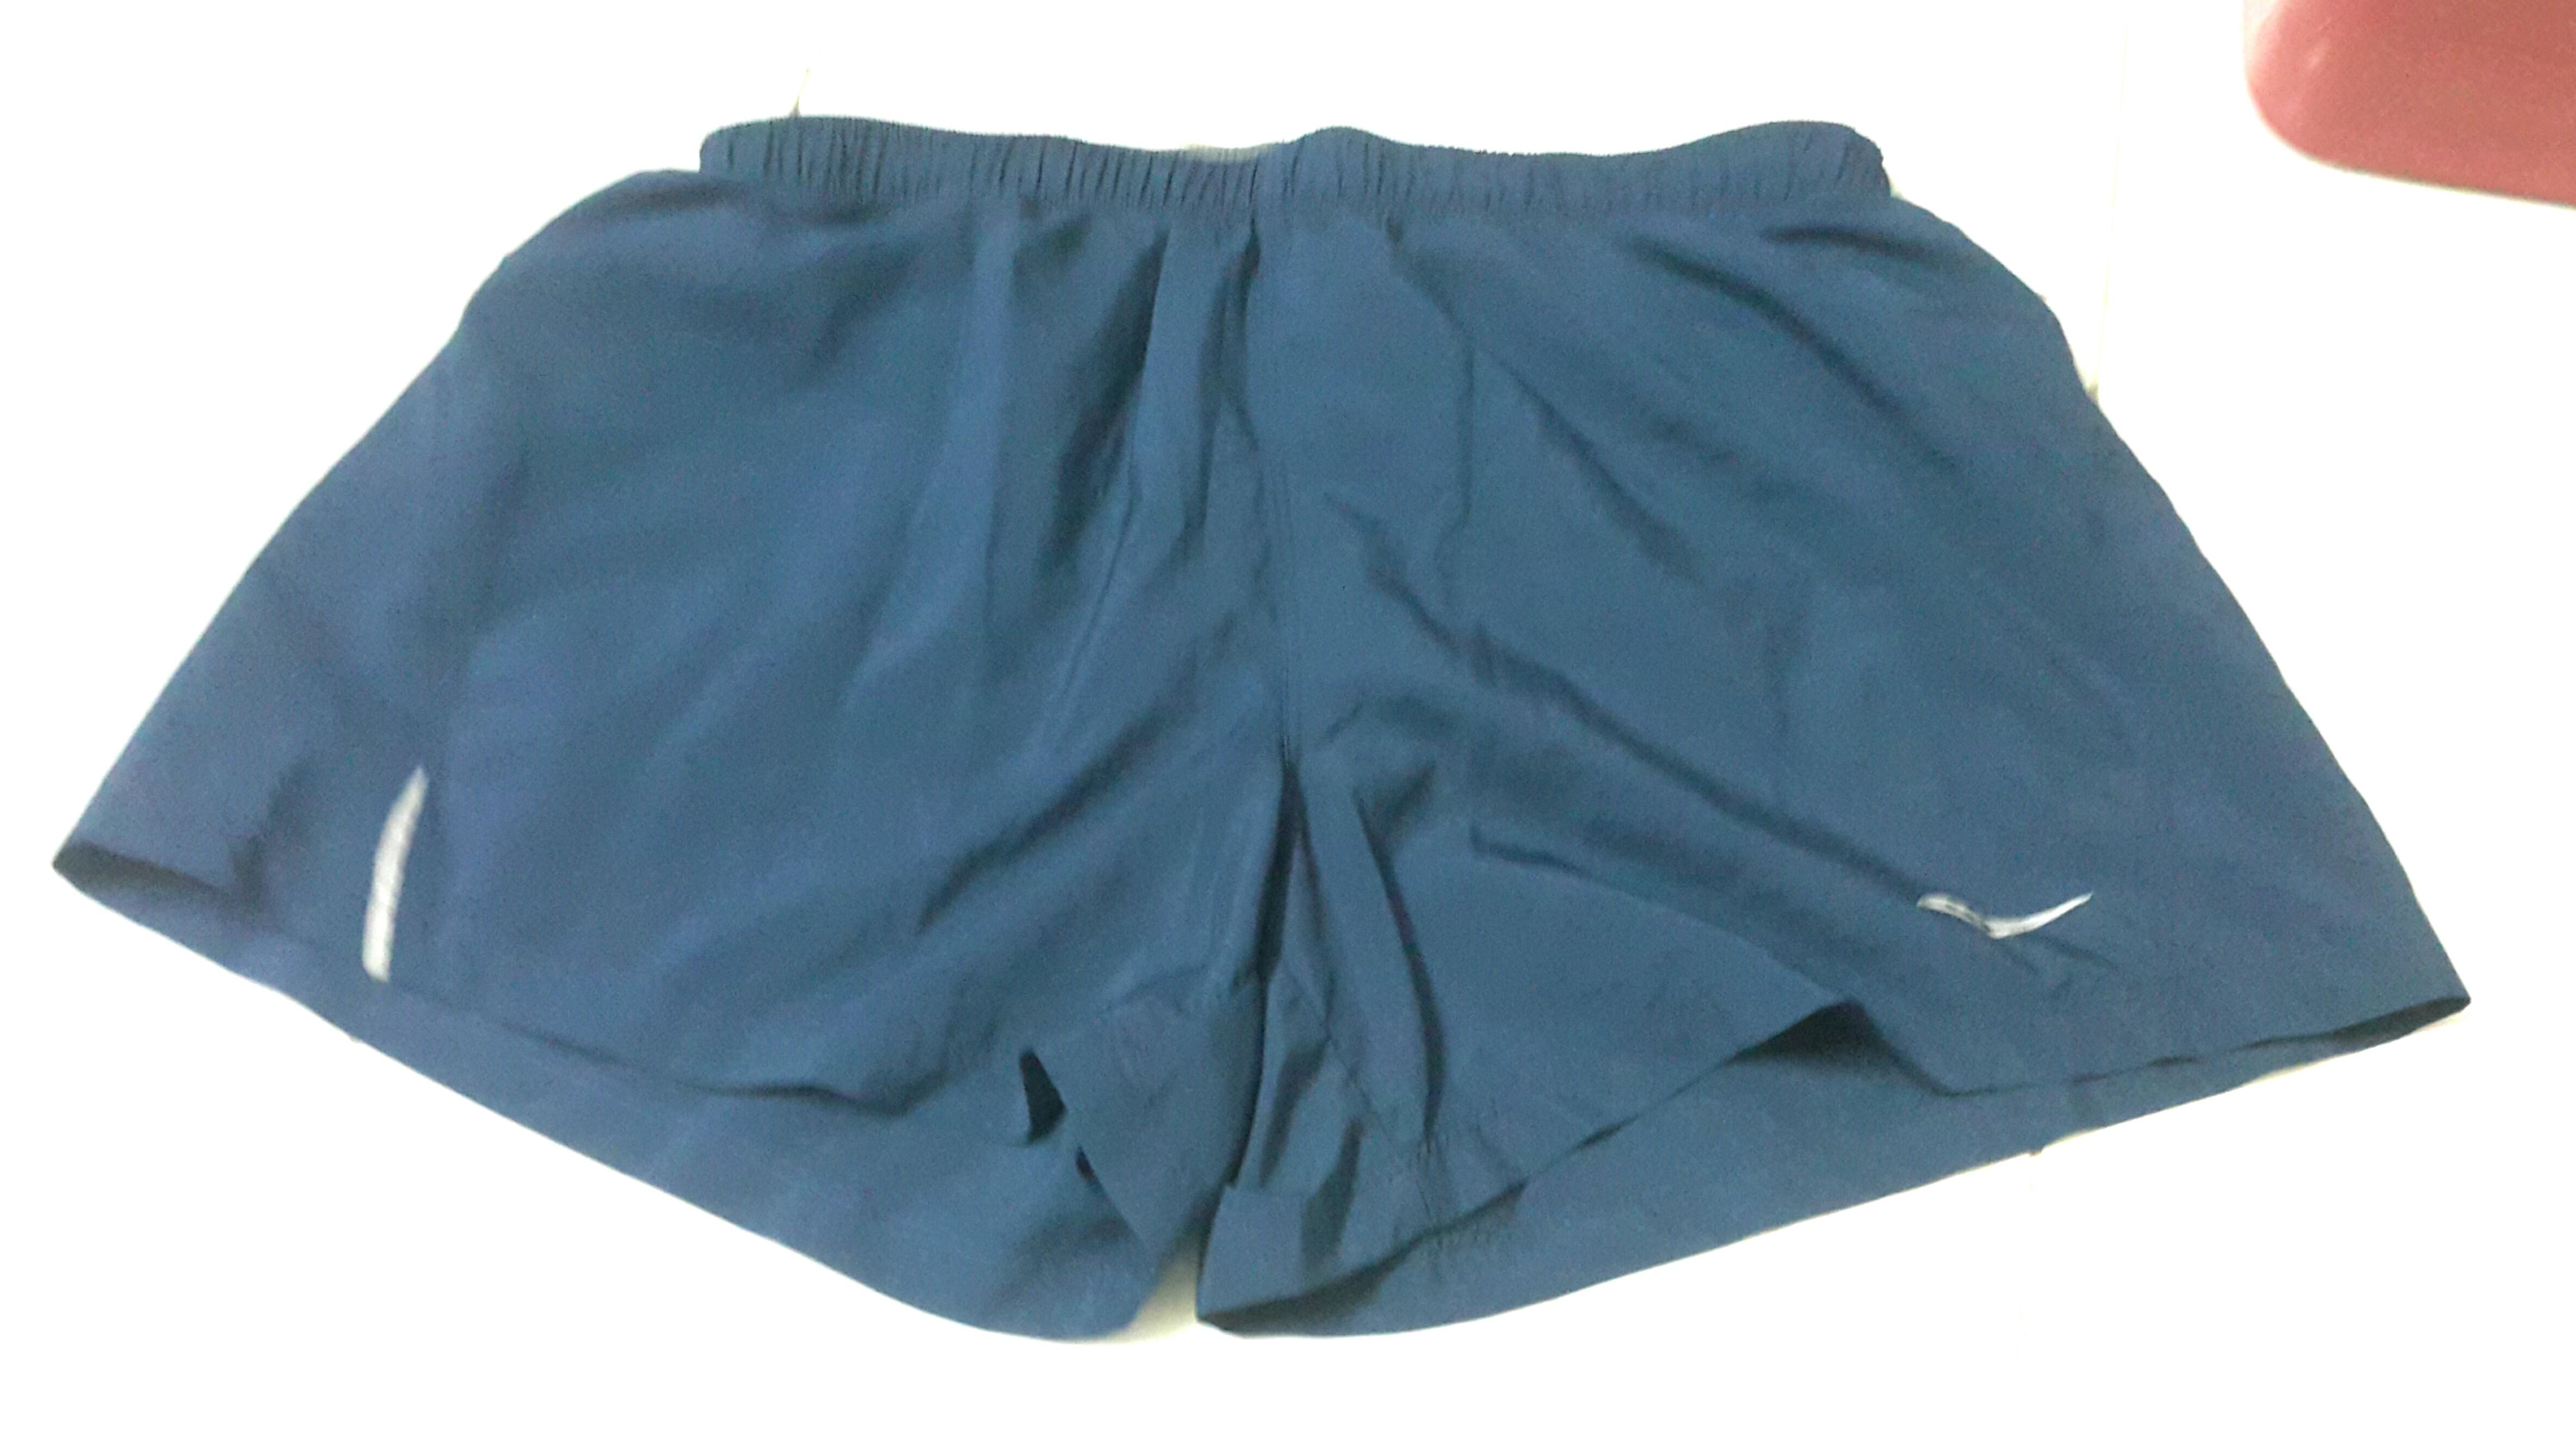 Saucony Running Shorts #UNDER90